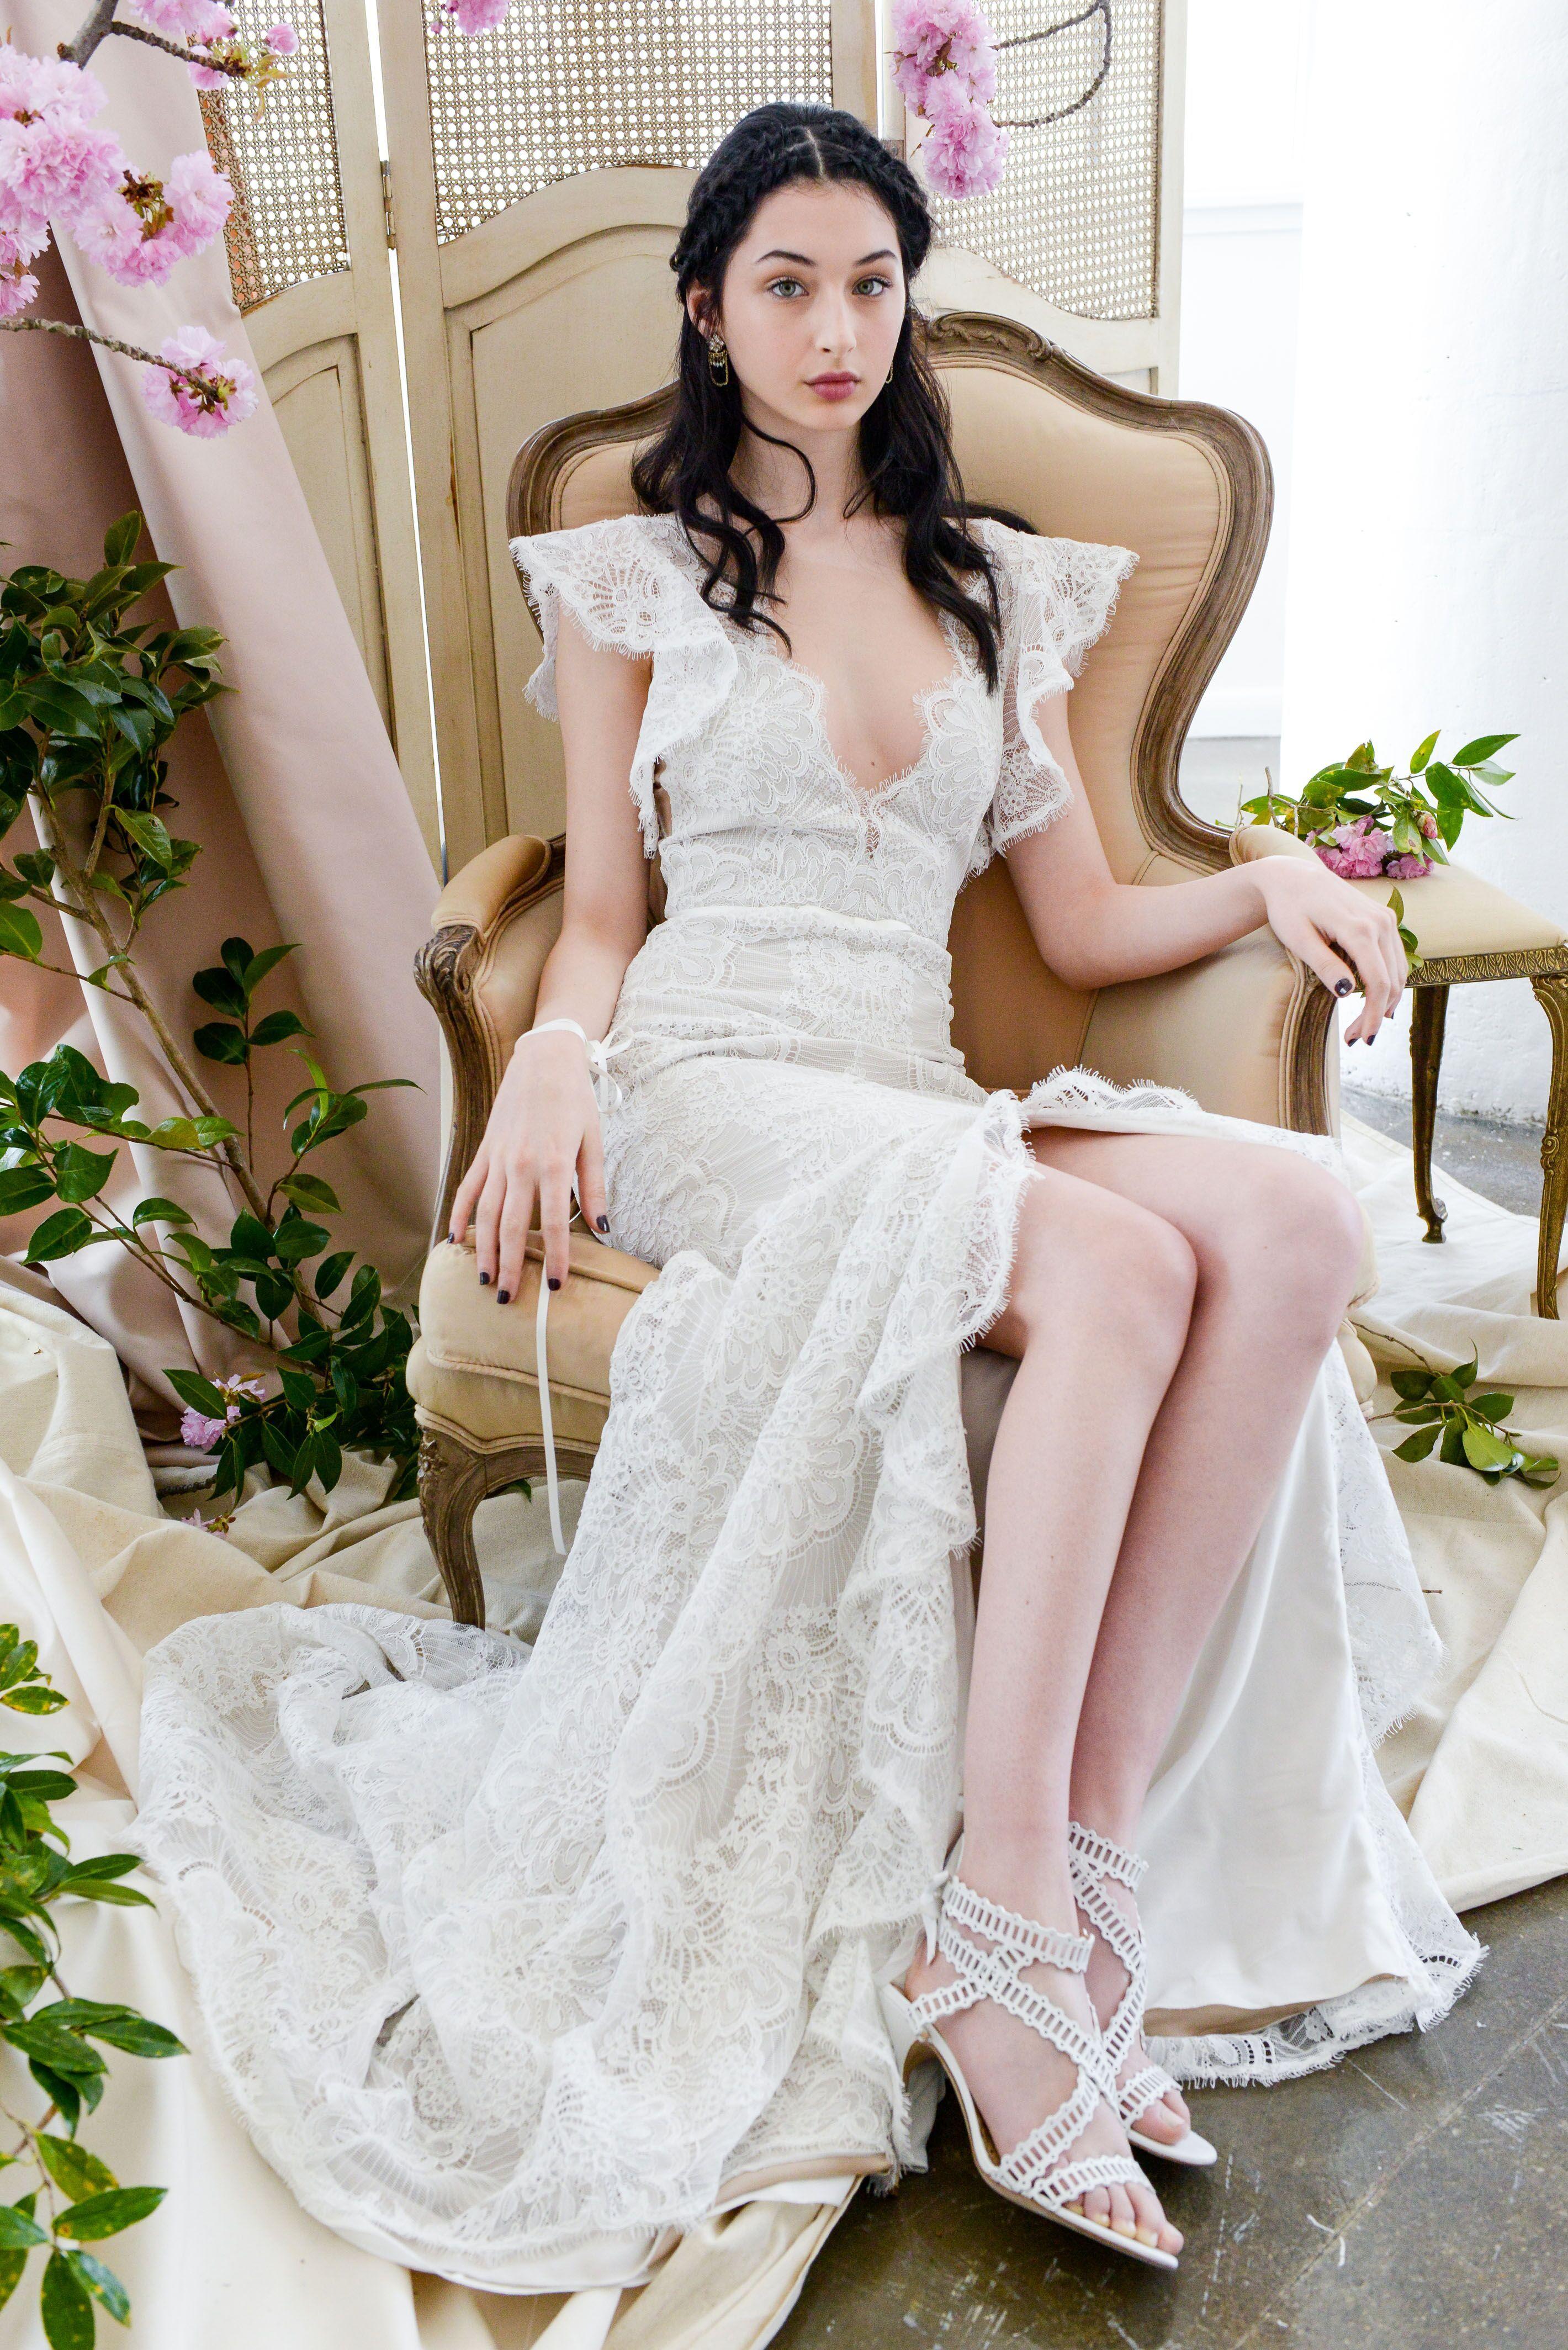 A Ss18 Marchesa Notte Bridal Look